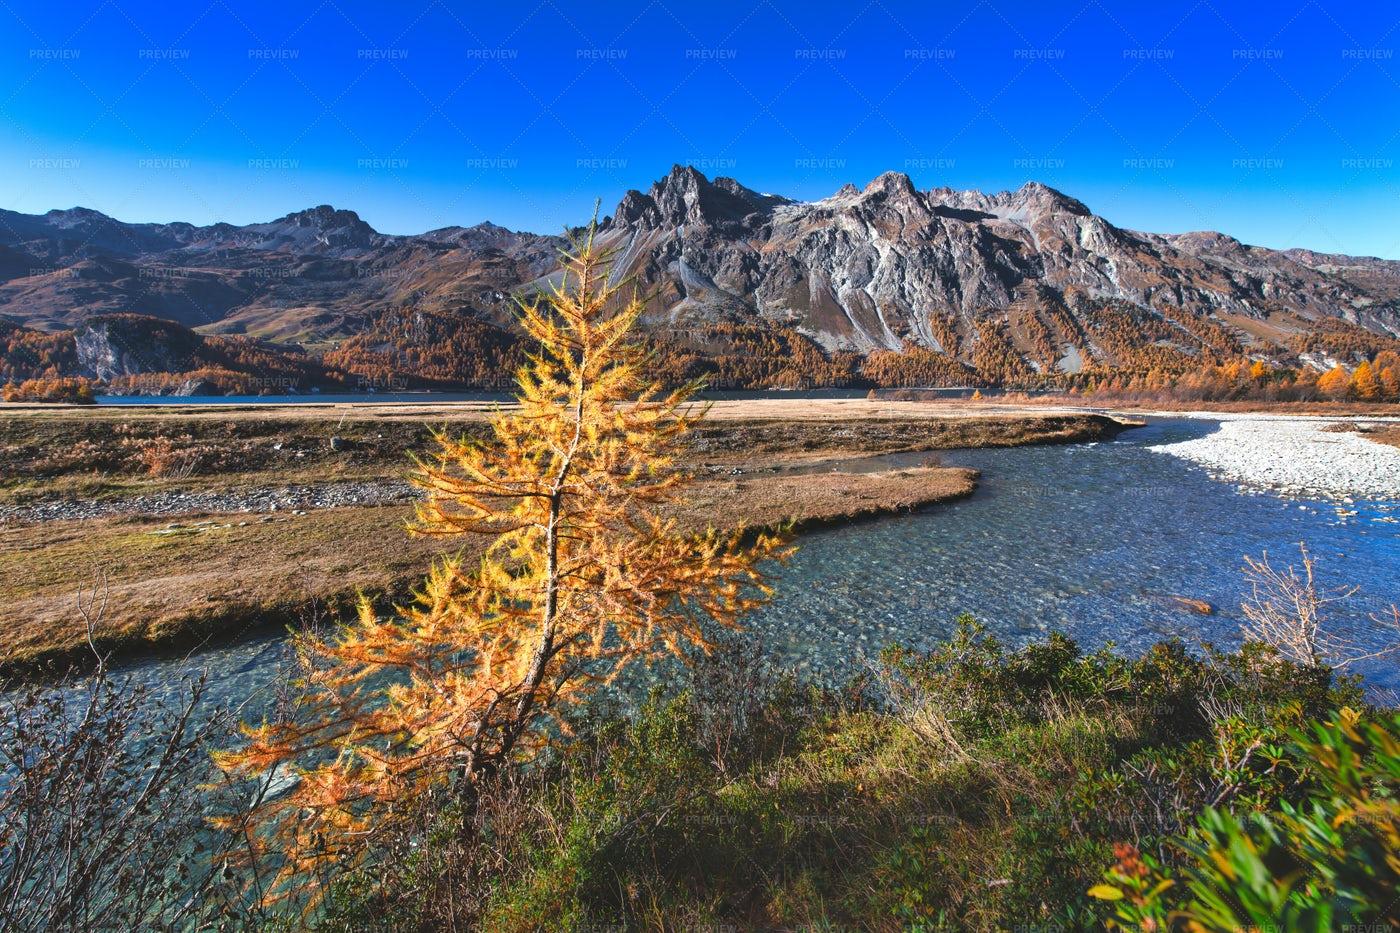 Engadine Autumn Landscap: Stock Photos